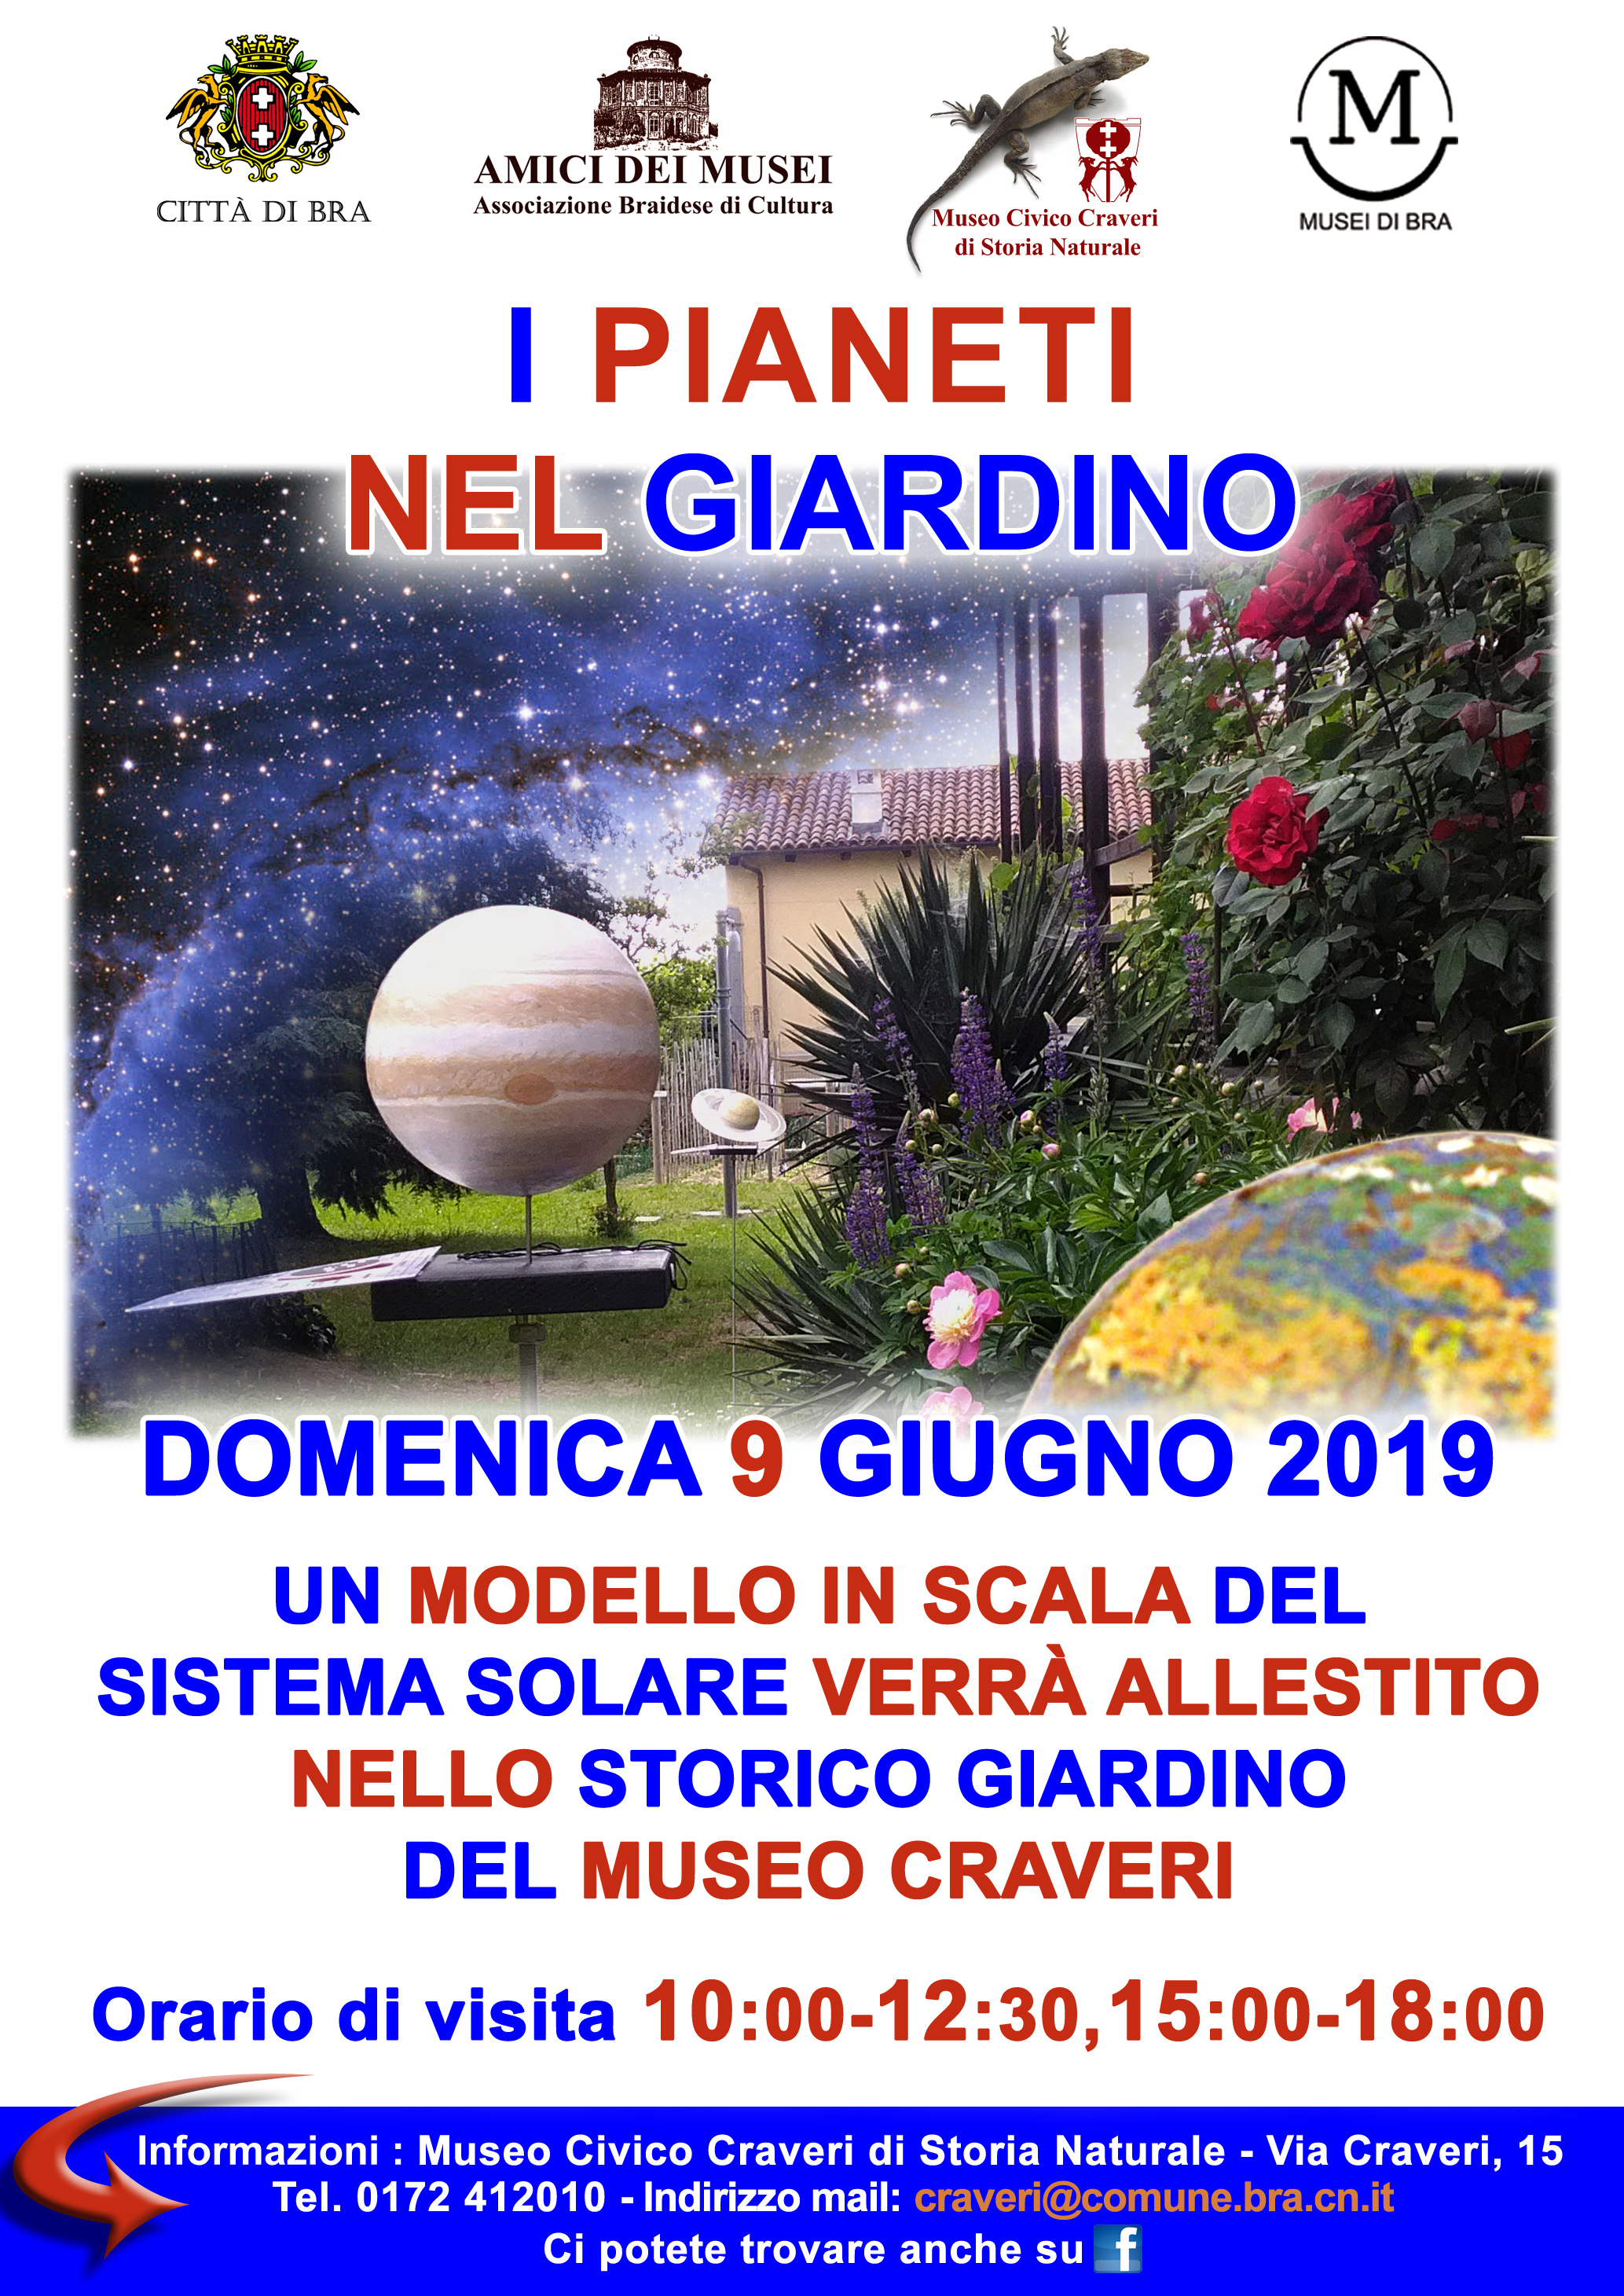 pianeti giardino 9 giugno 19